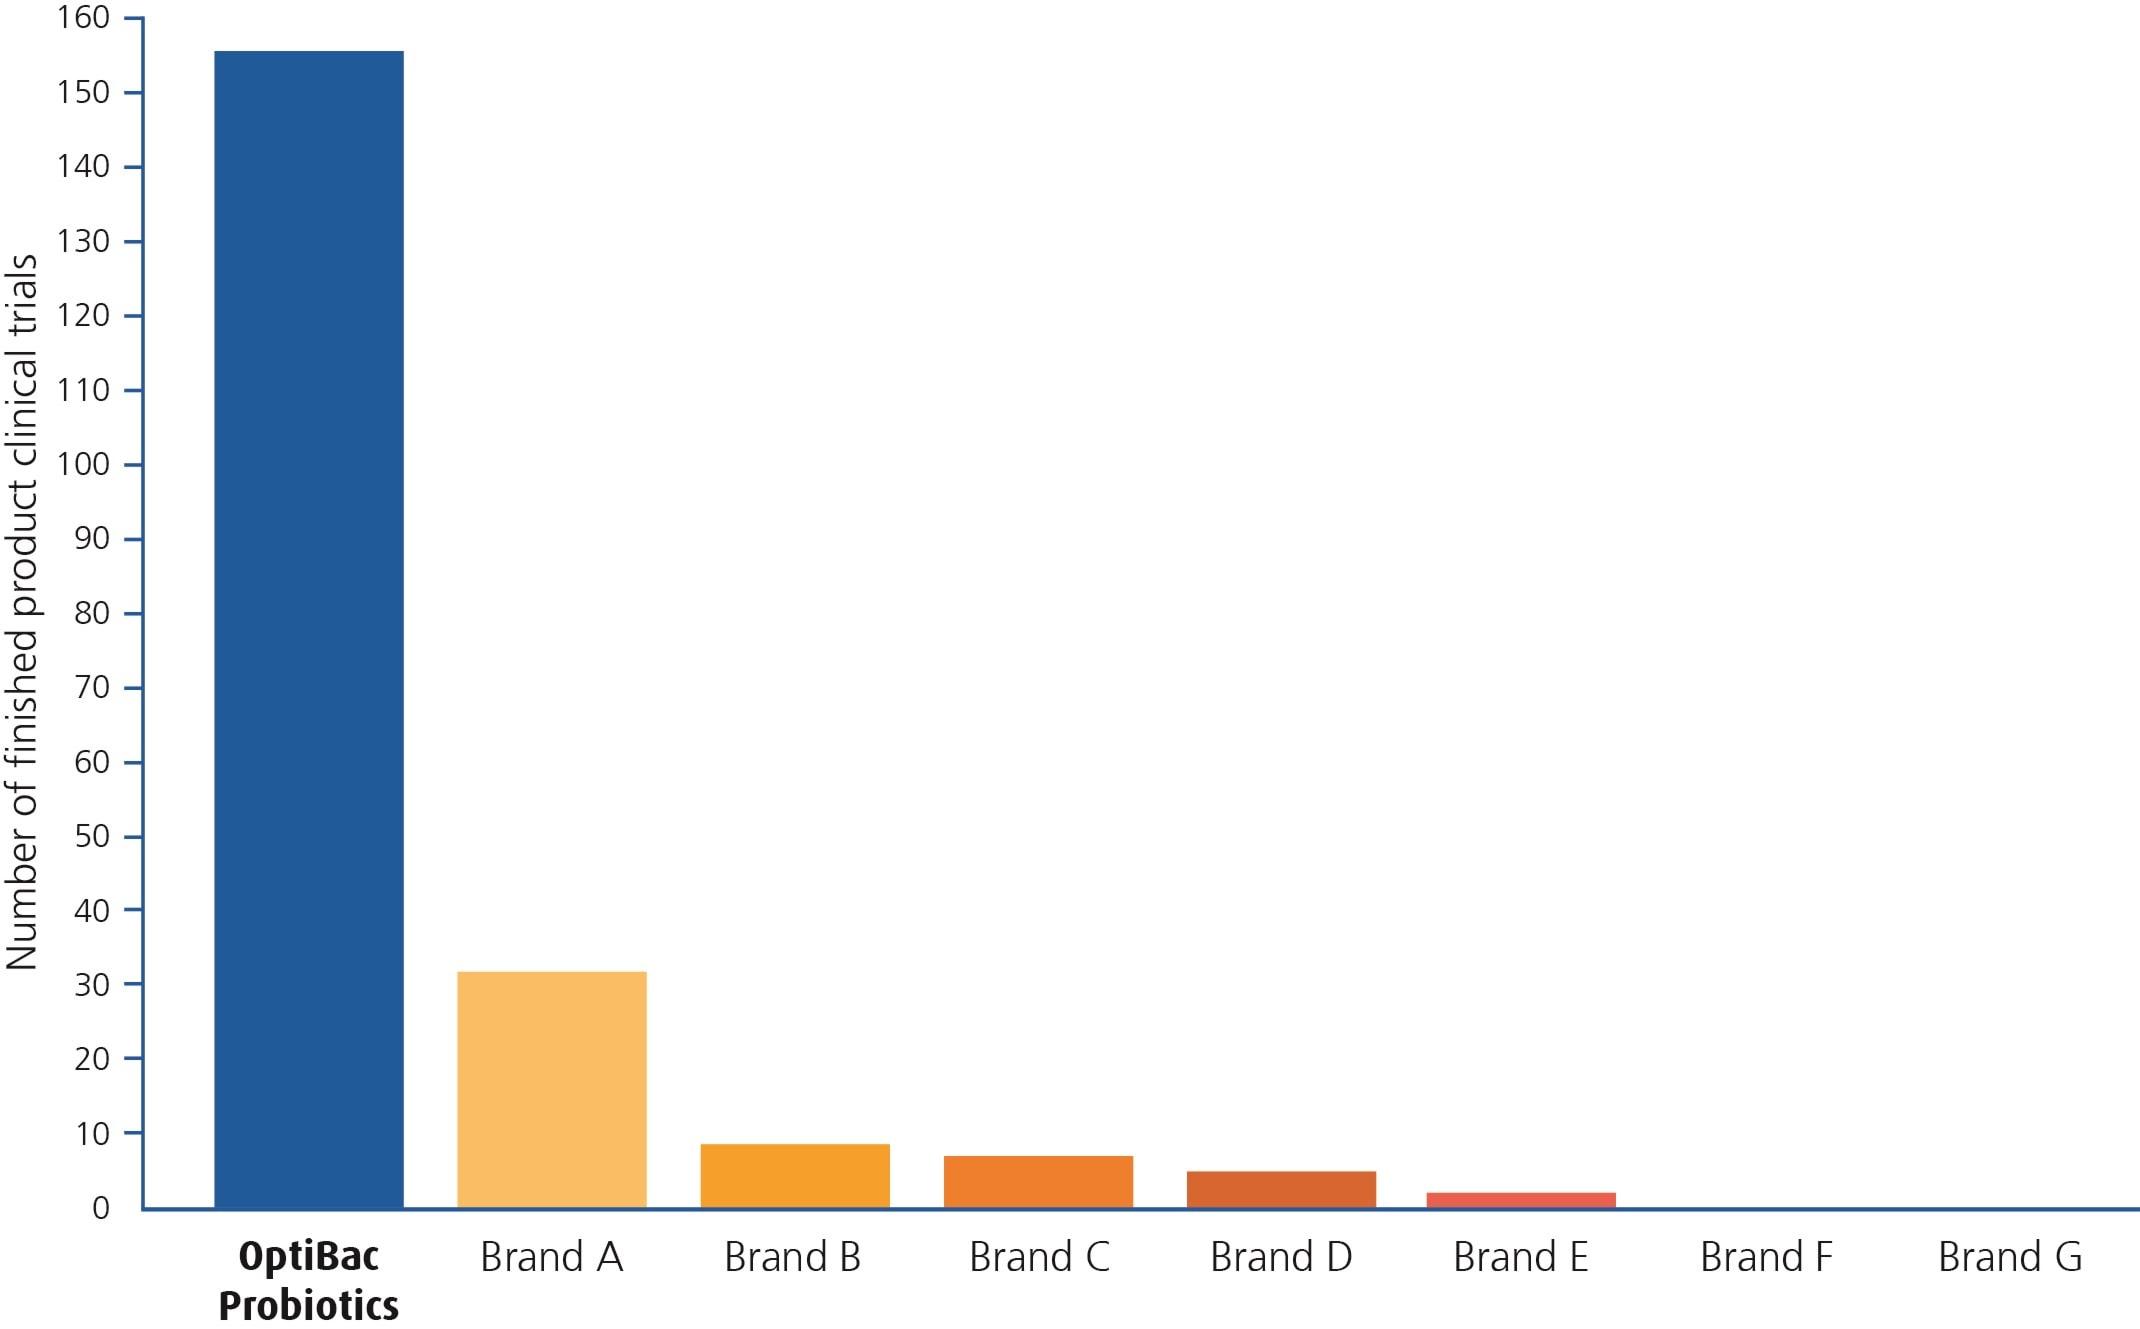 Graph comparing probiotic brands